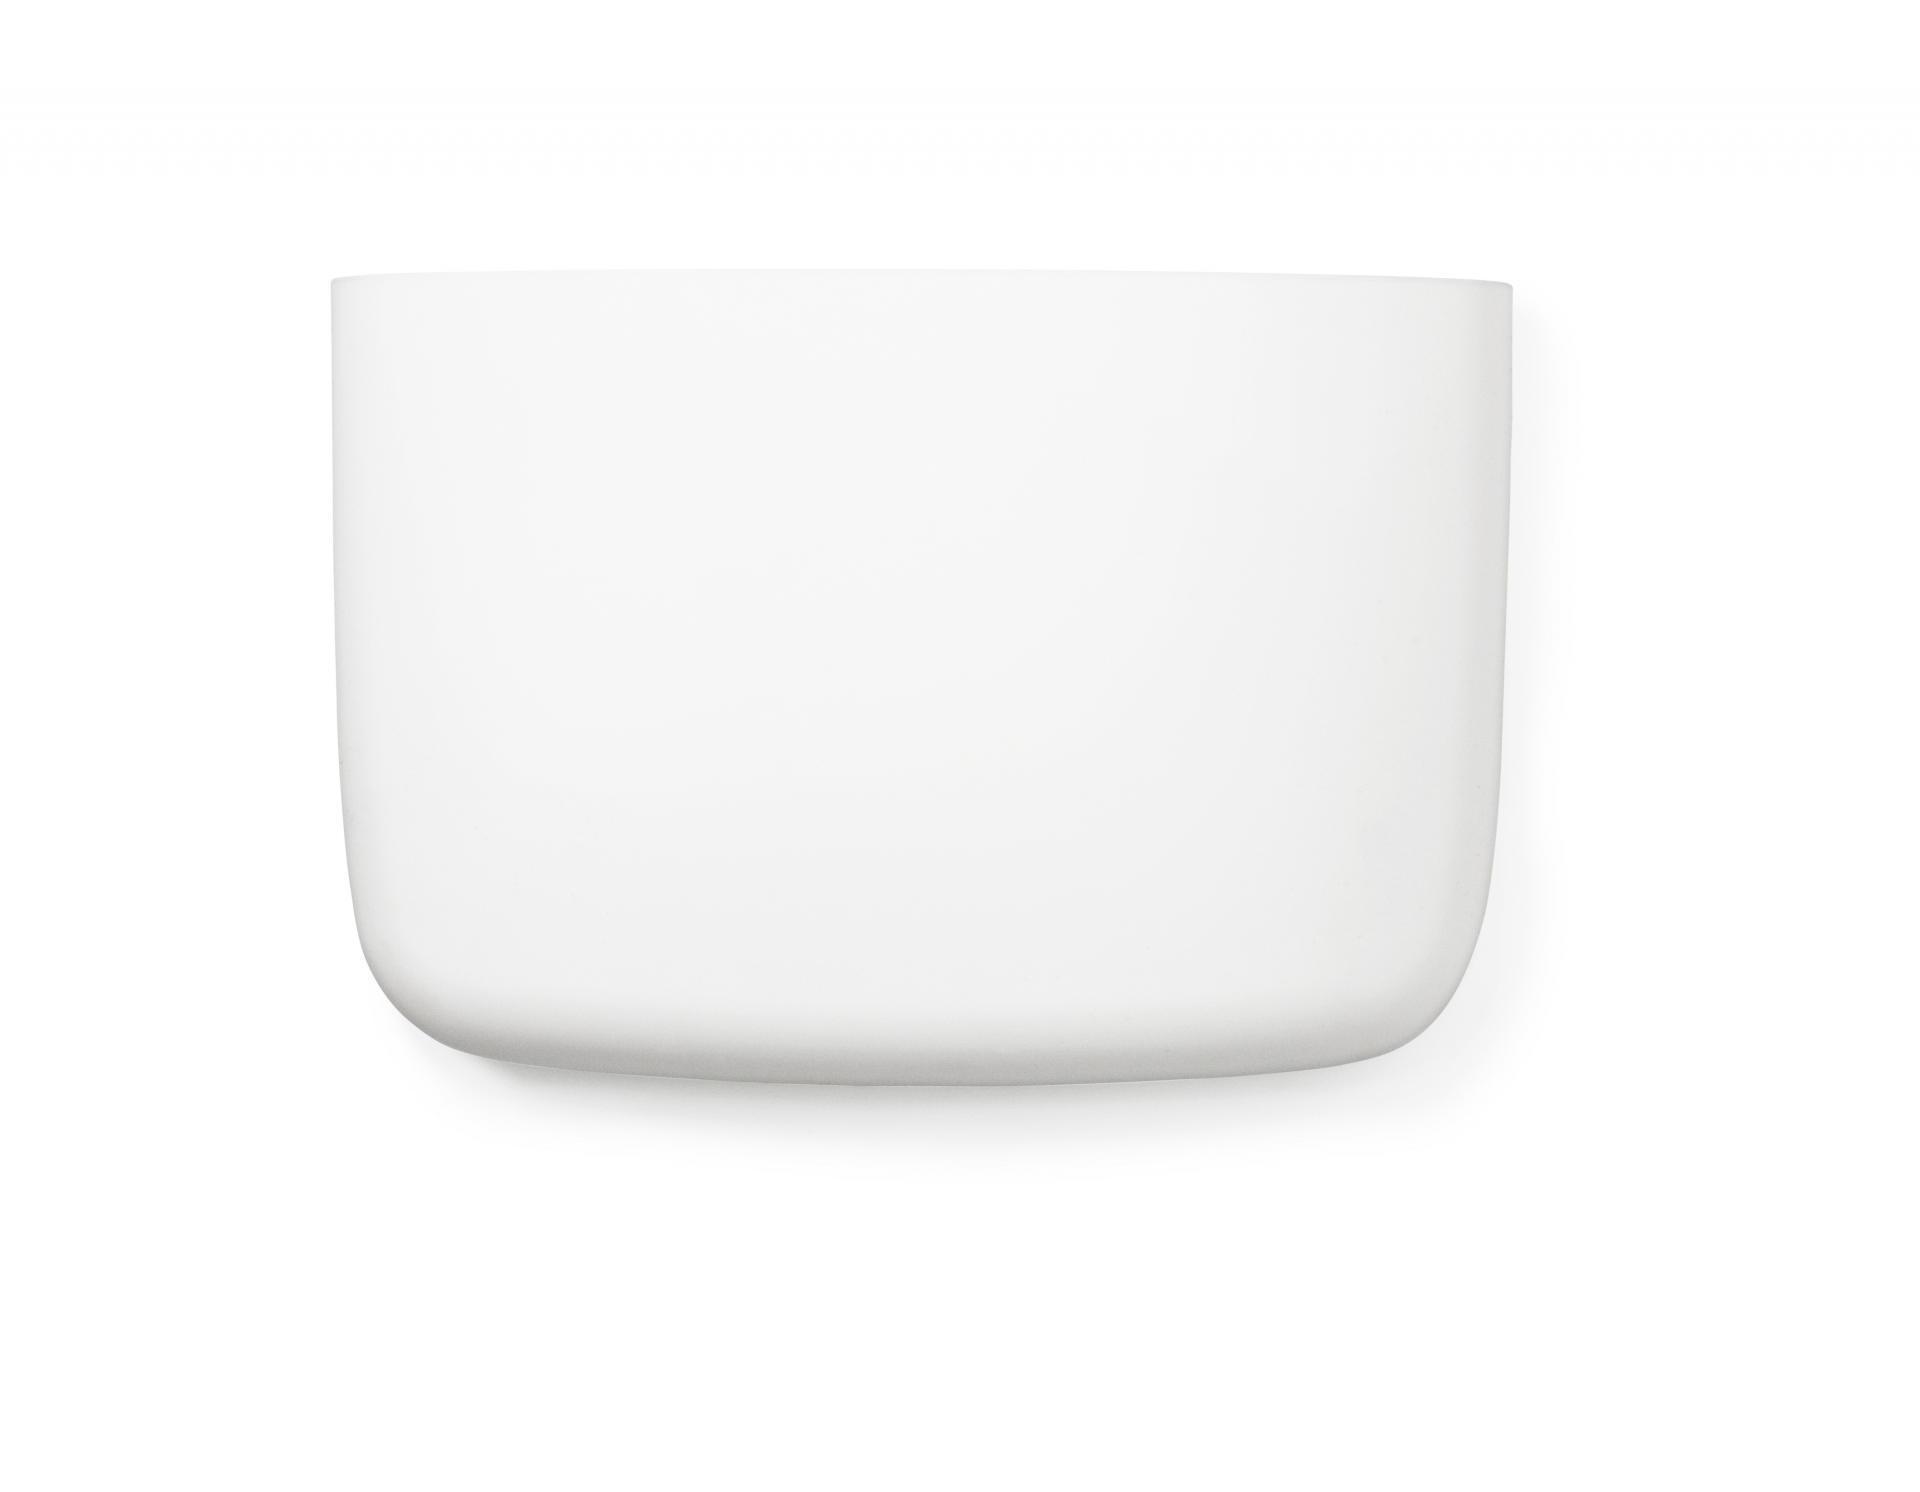 normann COPENHAGEN Nástěnný organizér White Pocket 4, bílá barva, plast